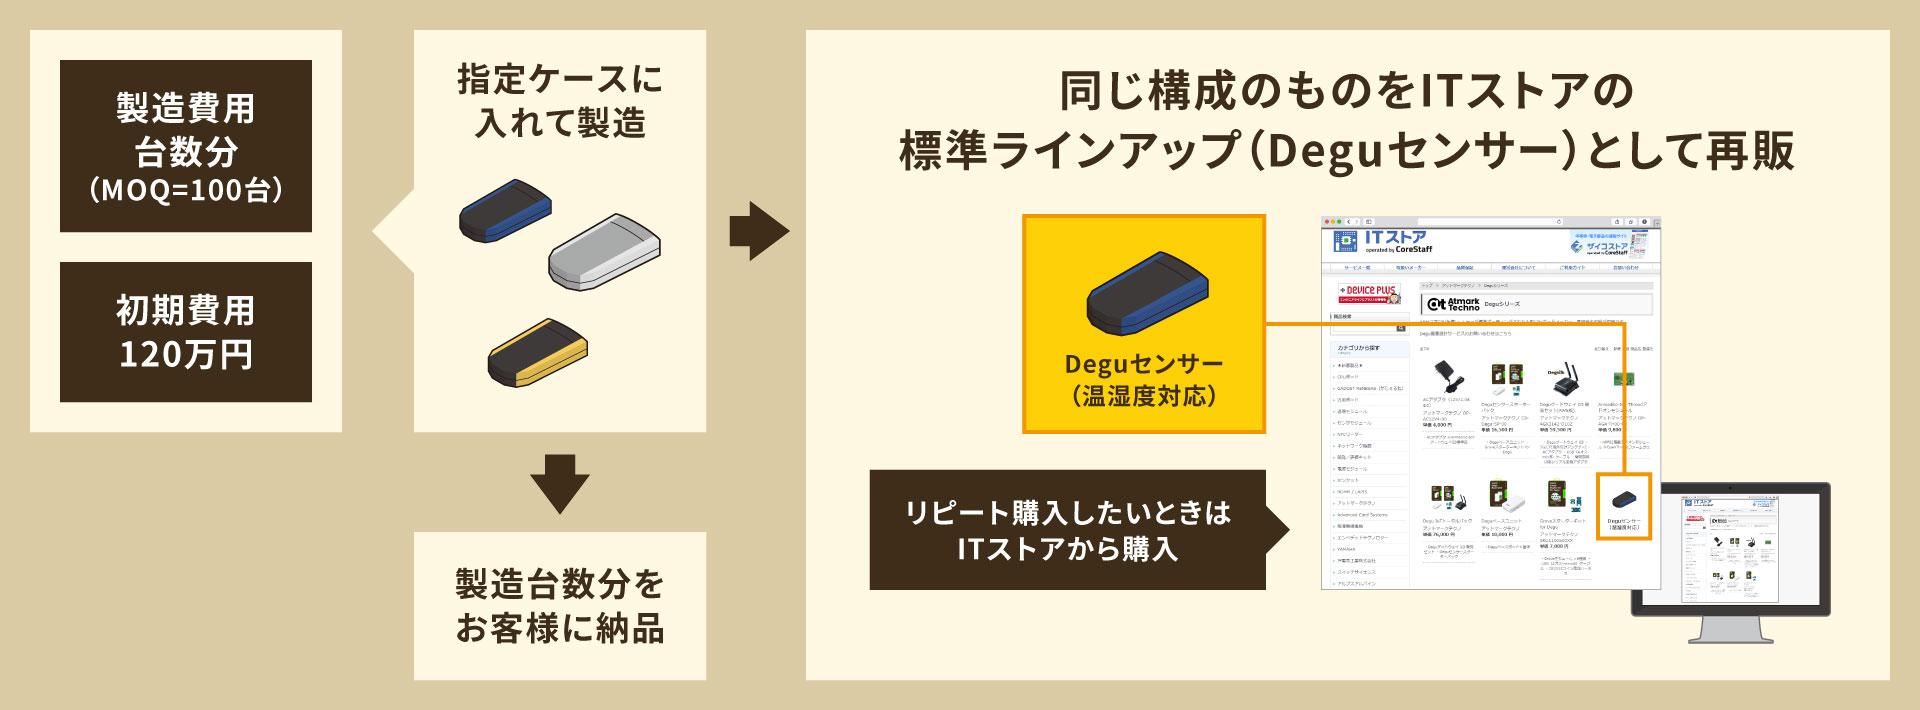 image_degu_02.jpg